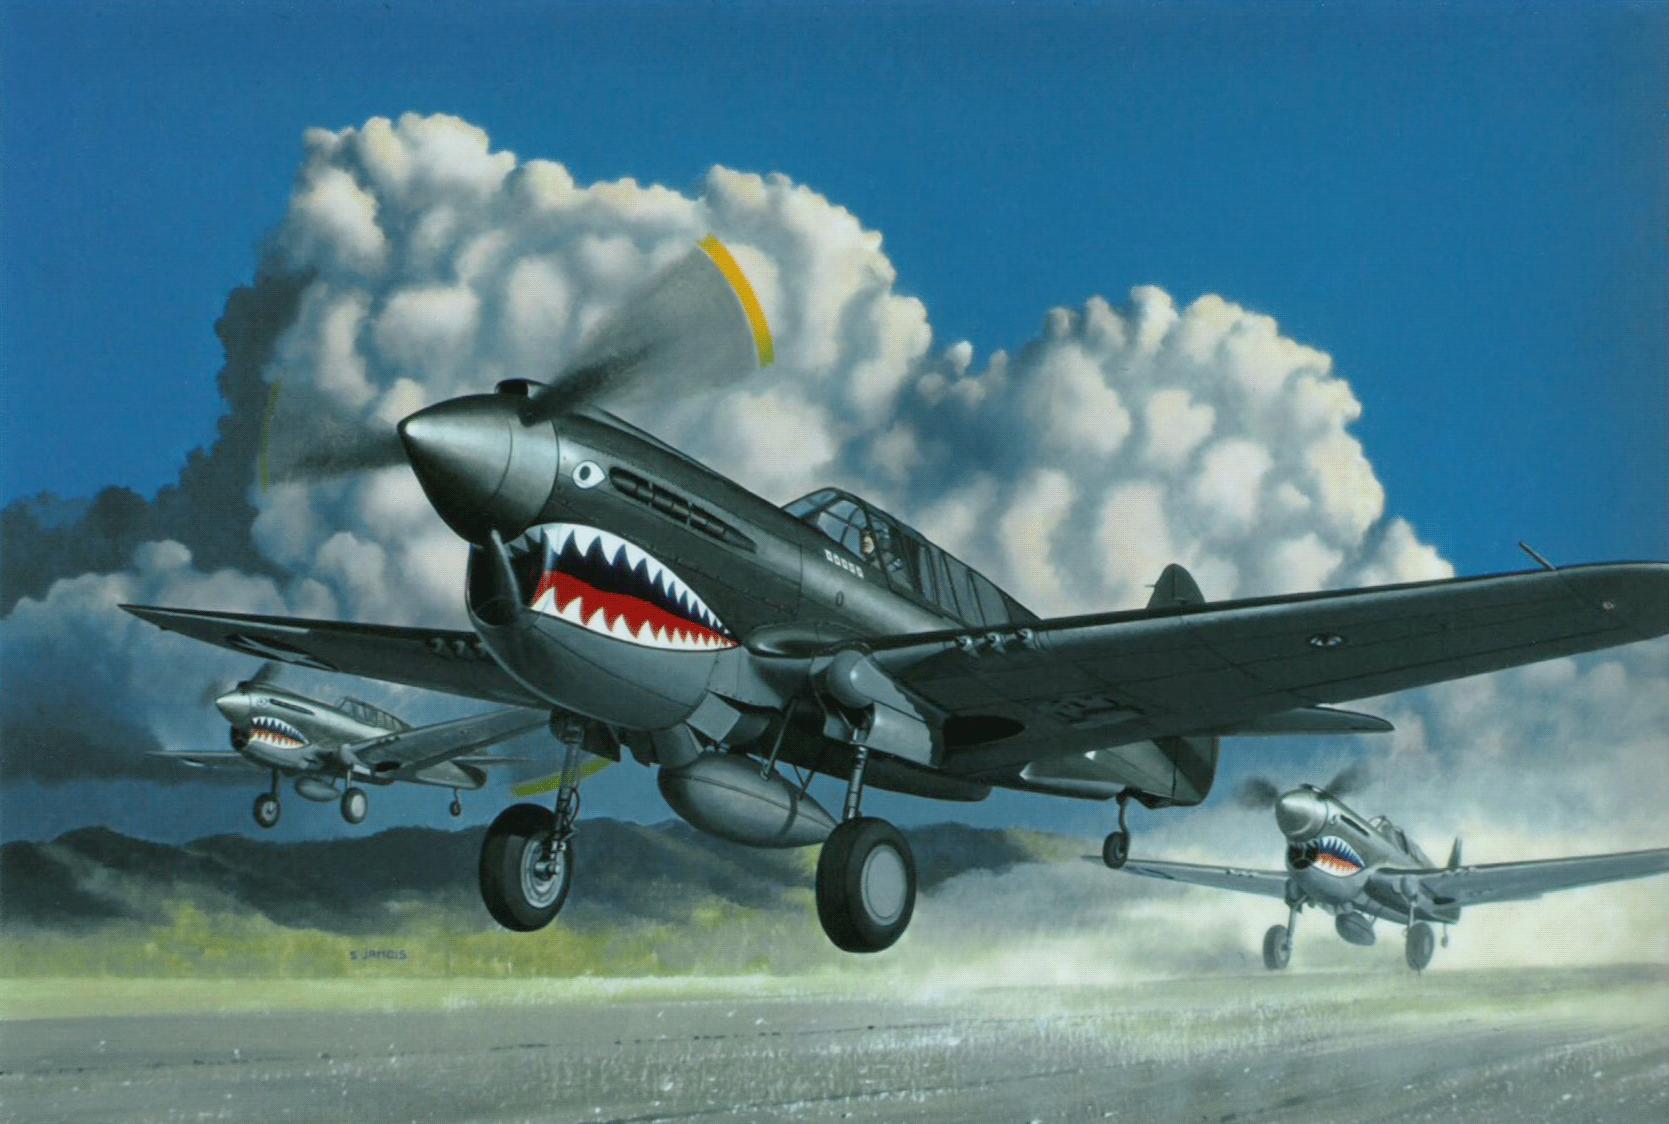 P40 Warhawk Wallpaper